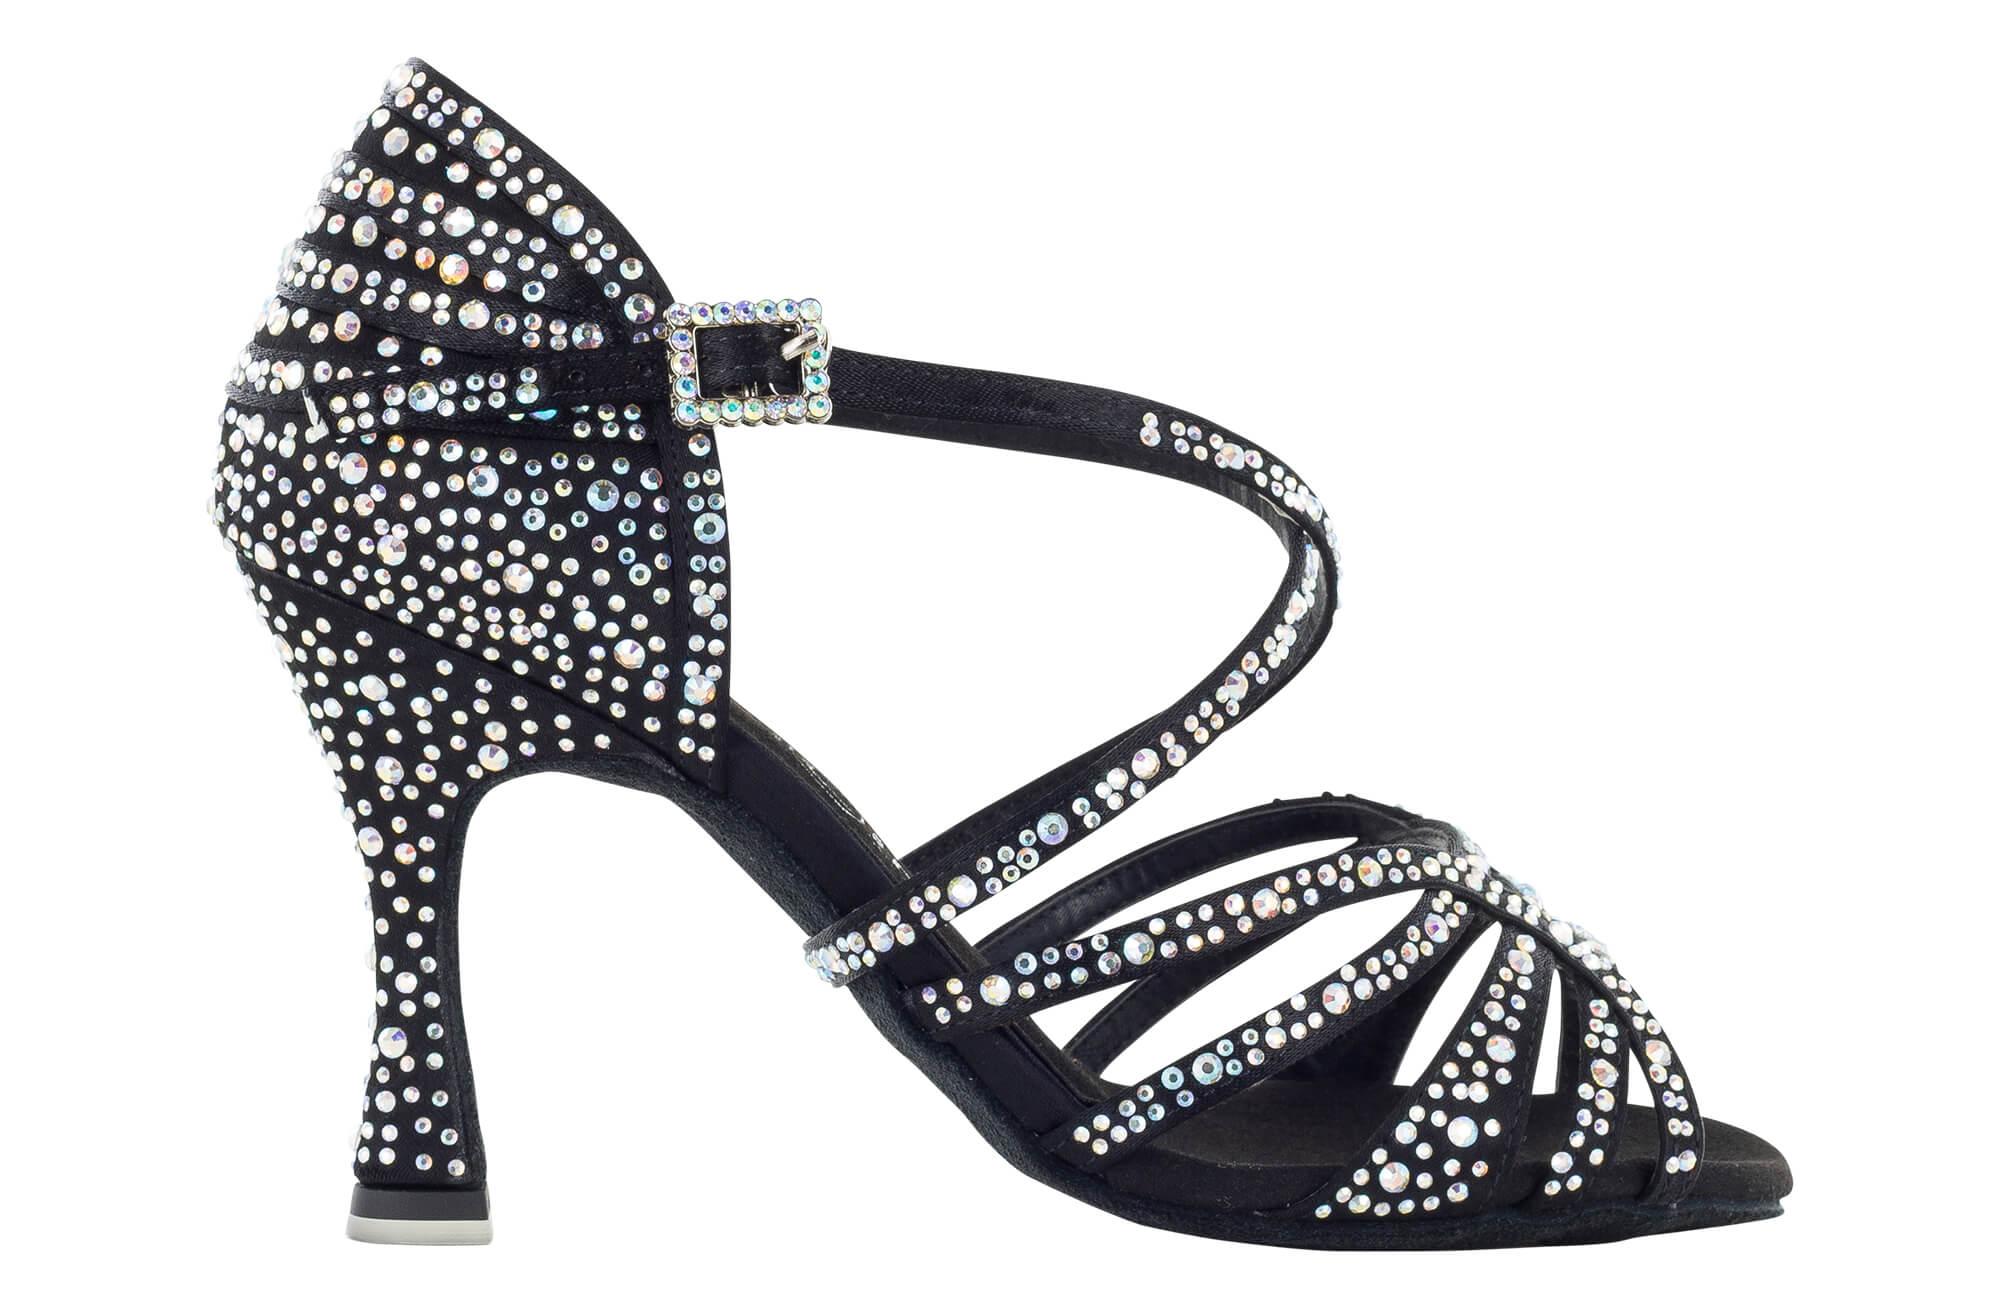 Zapato de baile Danc'in en Raso Negro de Tacón 8cm